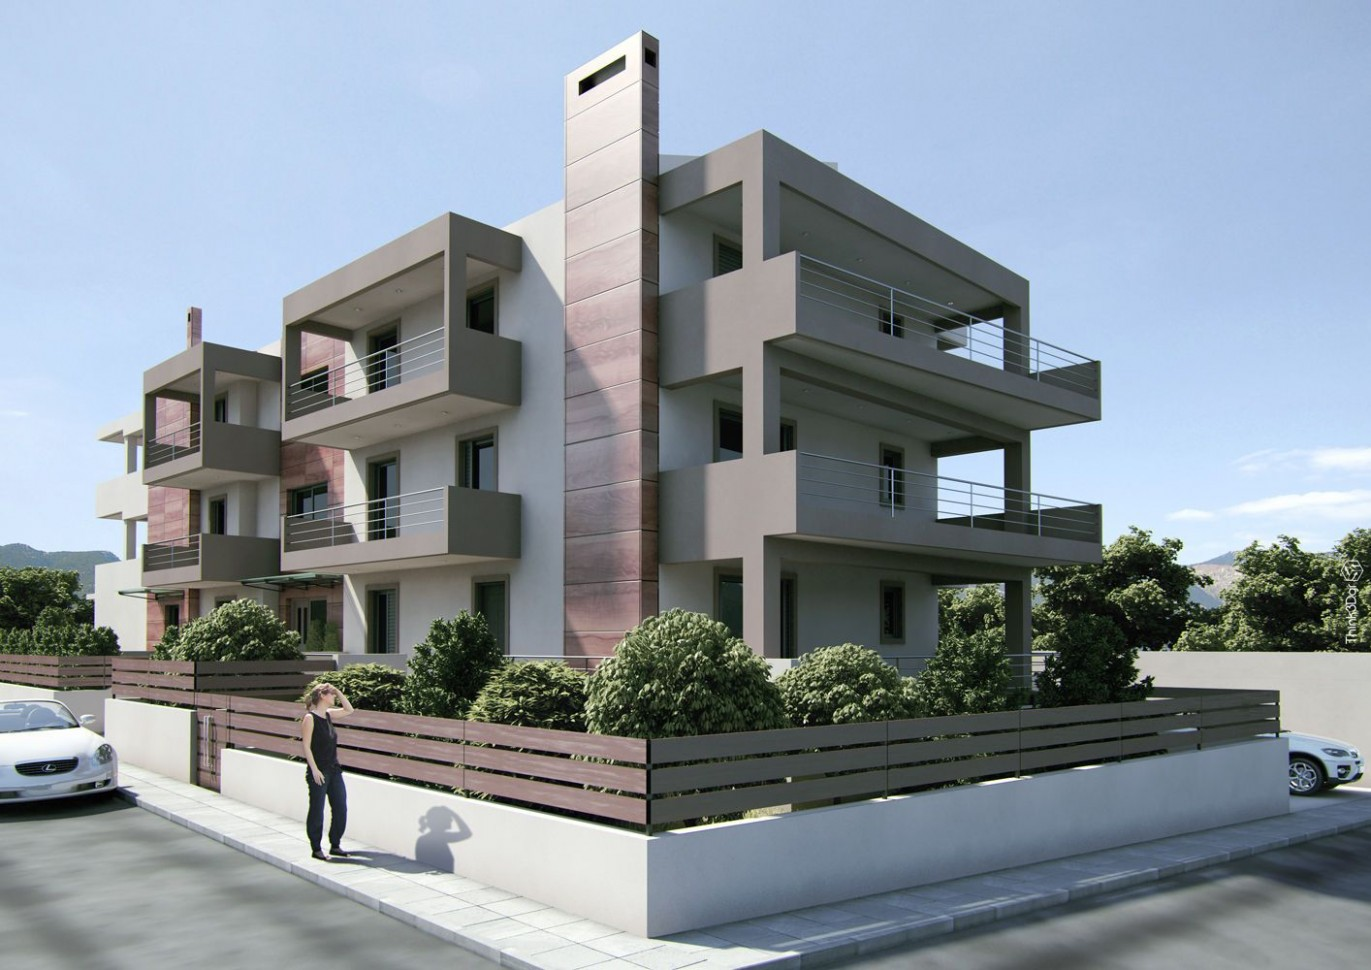 Apartment Building 12  Small apartment building, Modern apartment  - Apartment Design Building